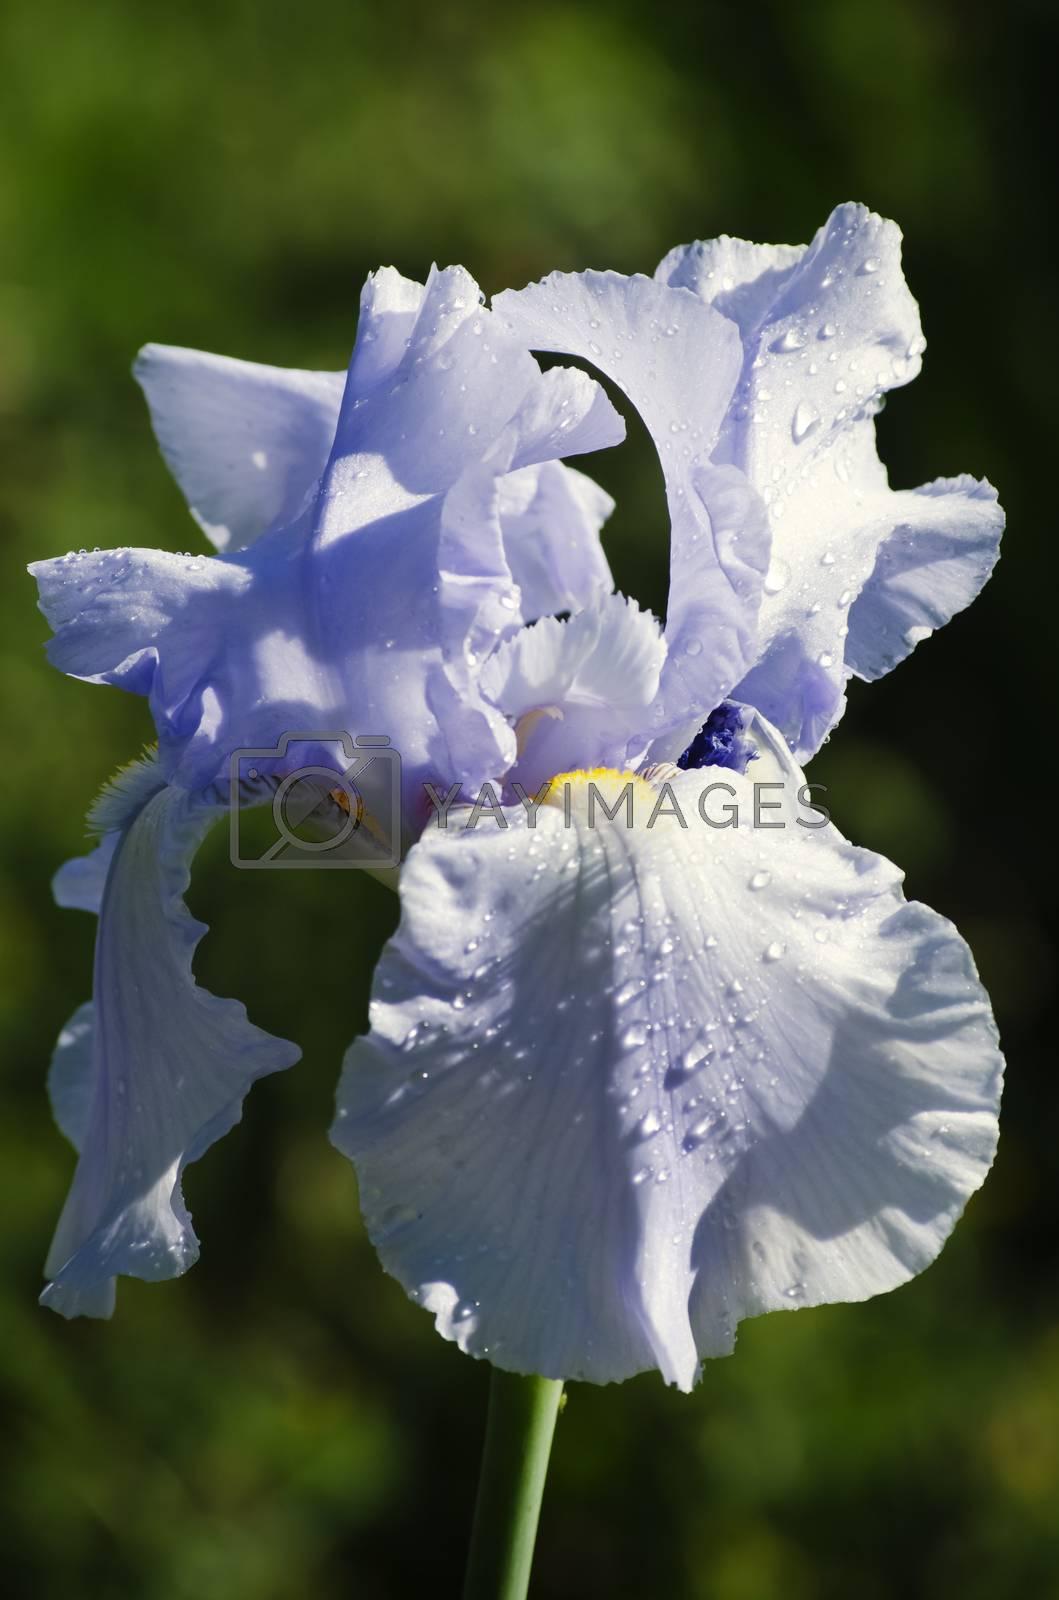 Photo of Iris Flower in Springtime